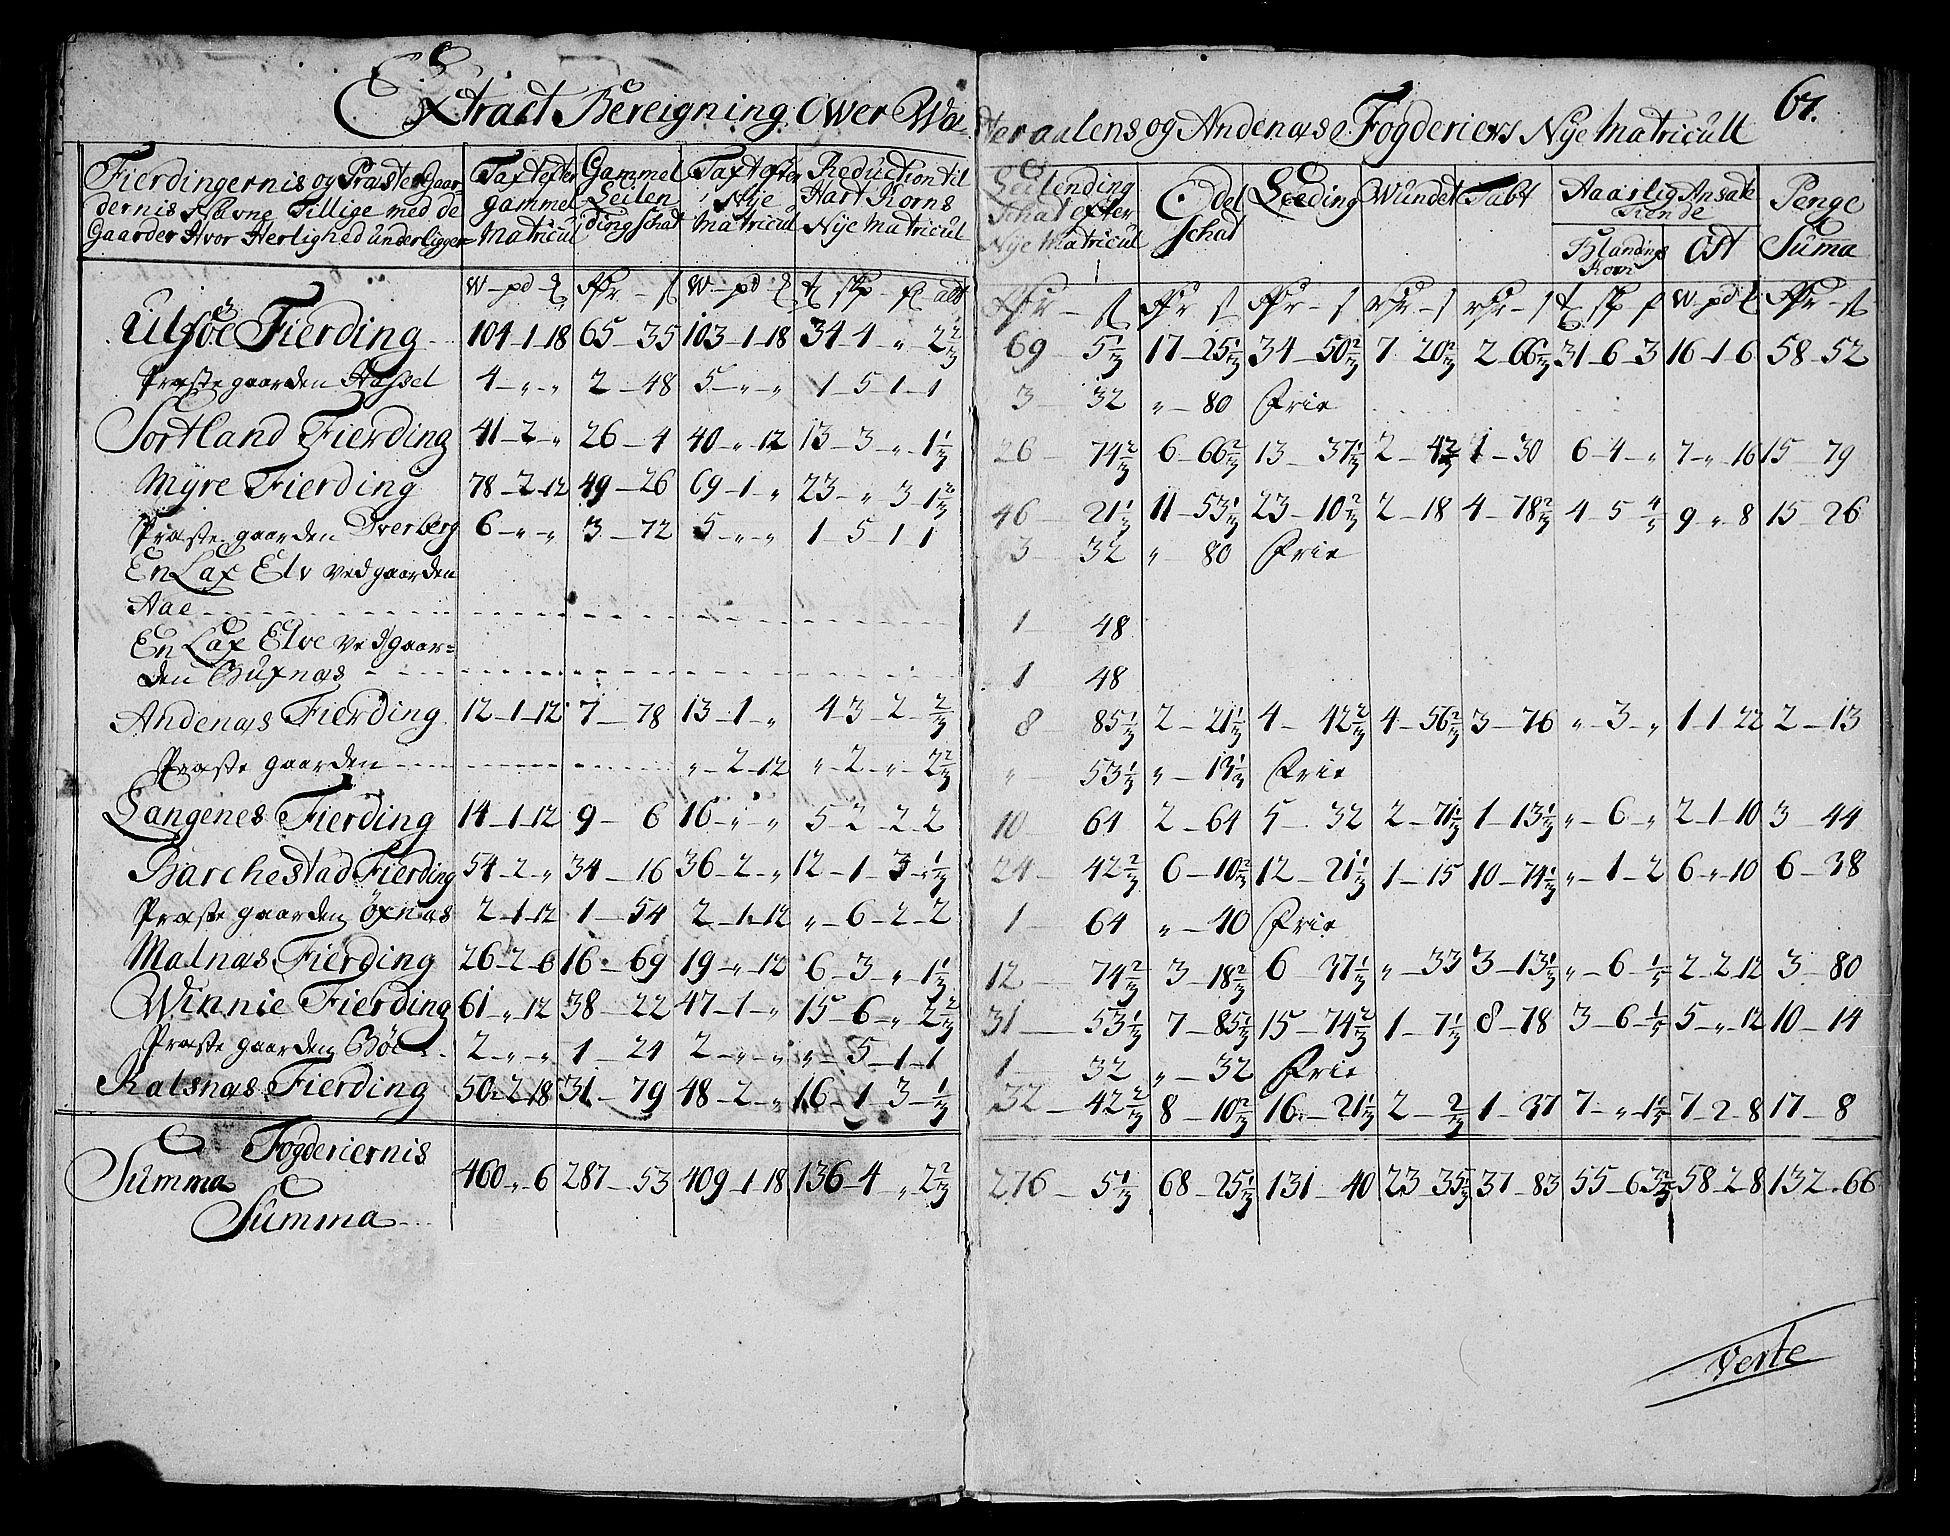 RA, Rentekammeret inntil 1814, Realistisk ordnet avdeling, N/Nb/Nbf/L0177: Vesterålen og Andenes matrikkelprotokoll, 1723, s. 66b-67a